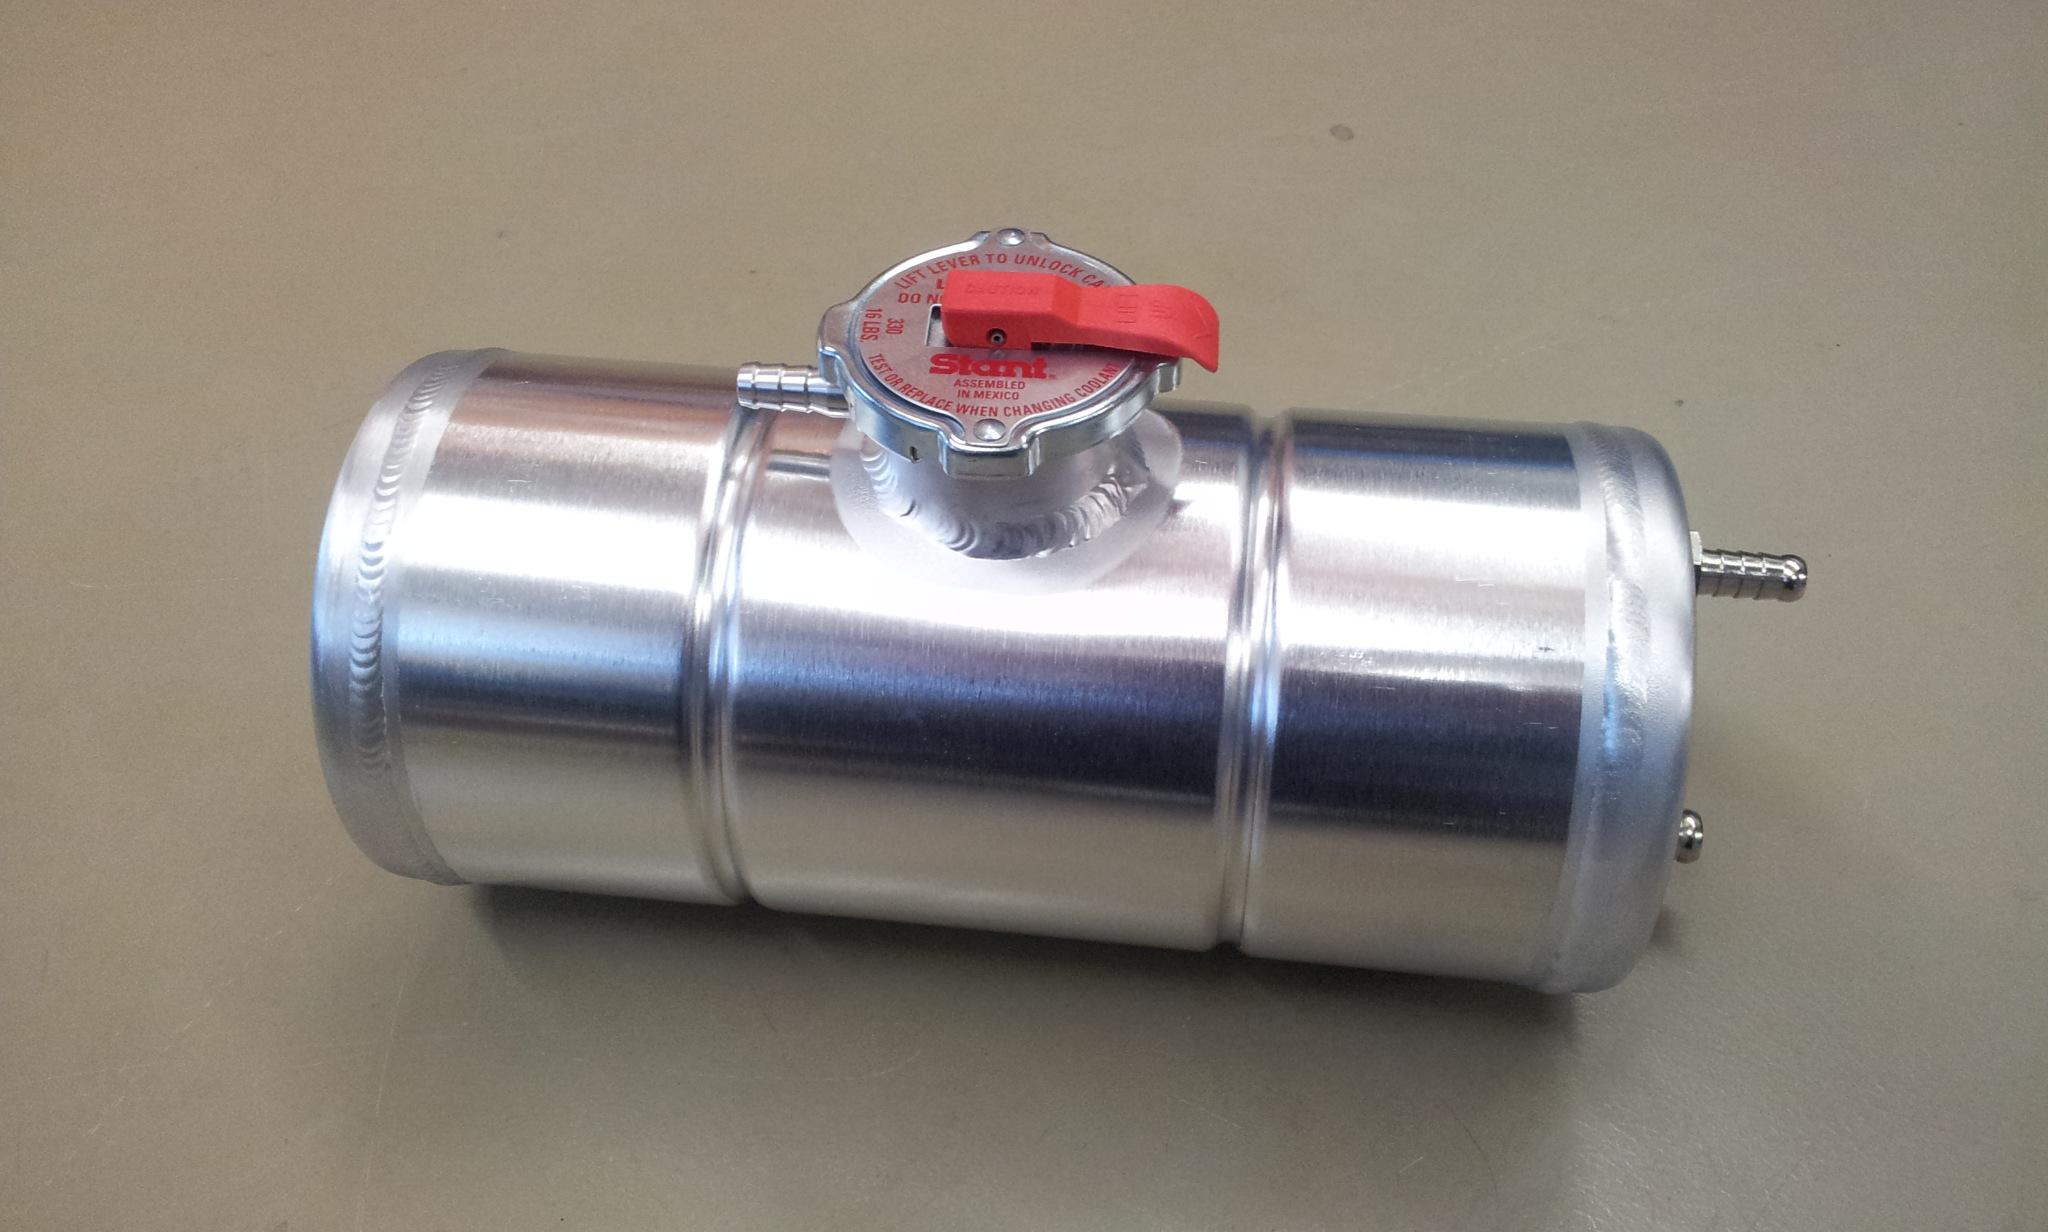 Expansie tank 2 Cobra rechts + radiateur dop.-0